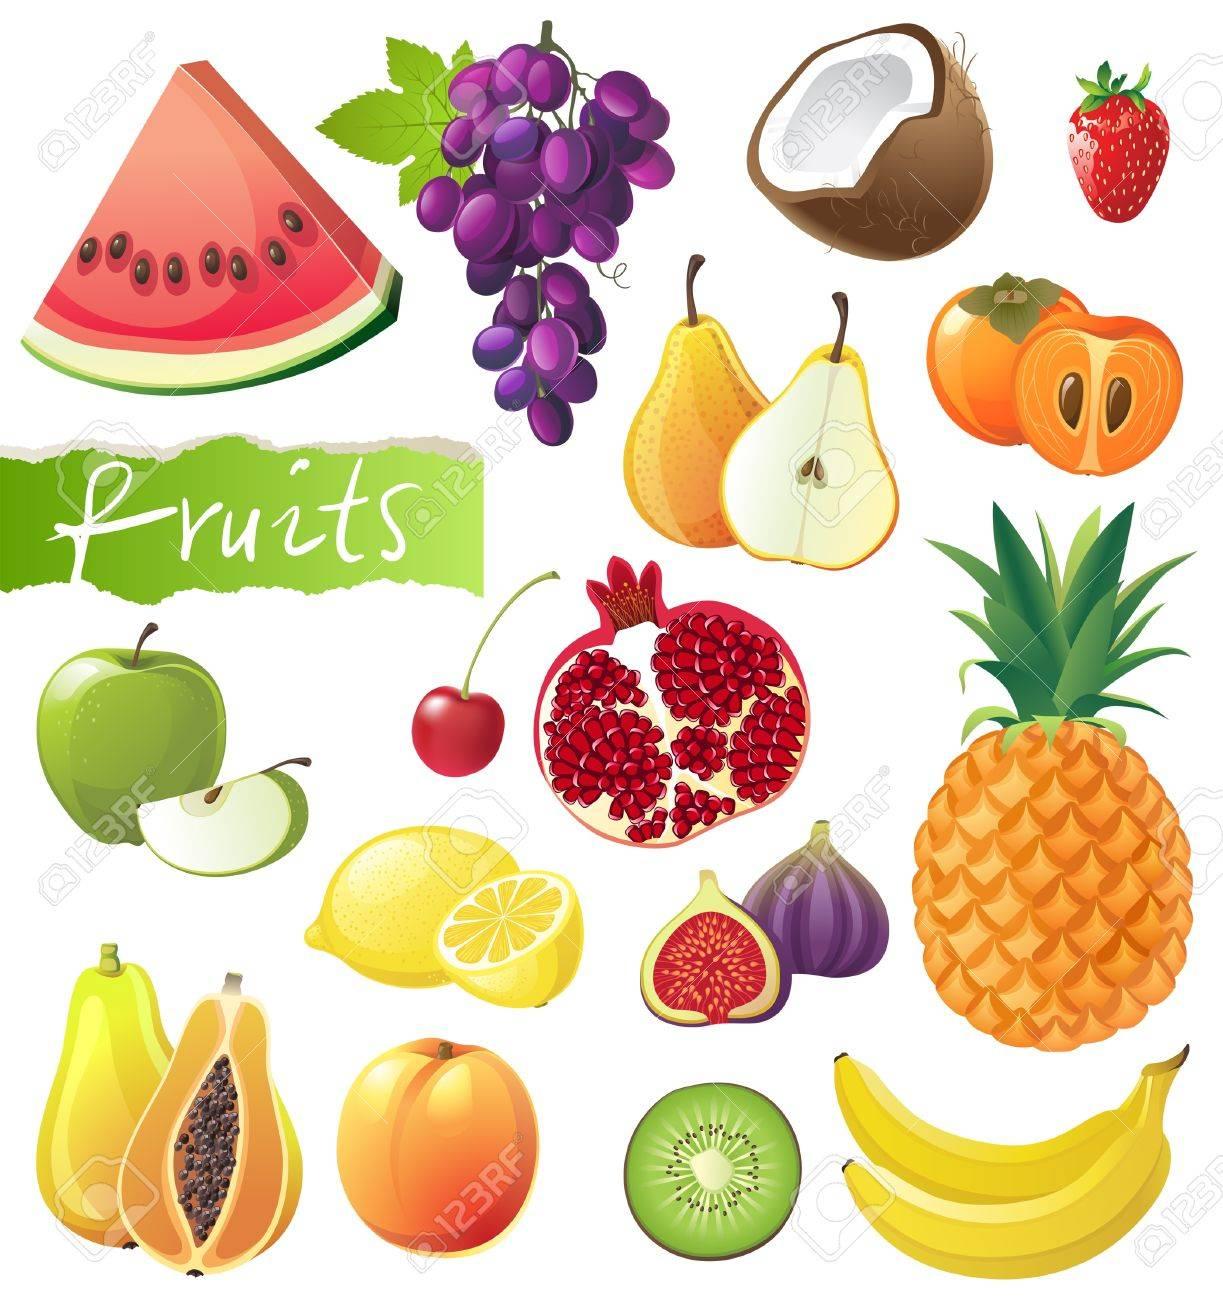 fresh juicy fruits set royalty free cliparts vectors and stock